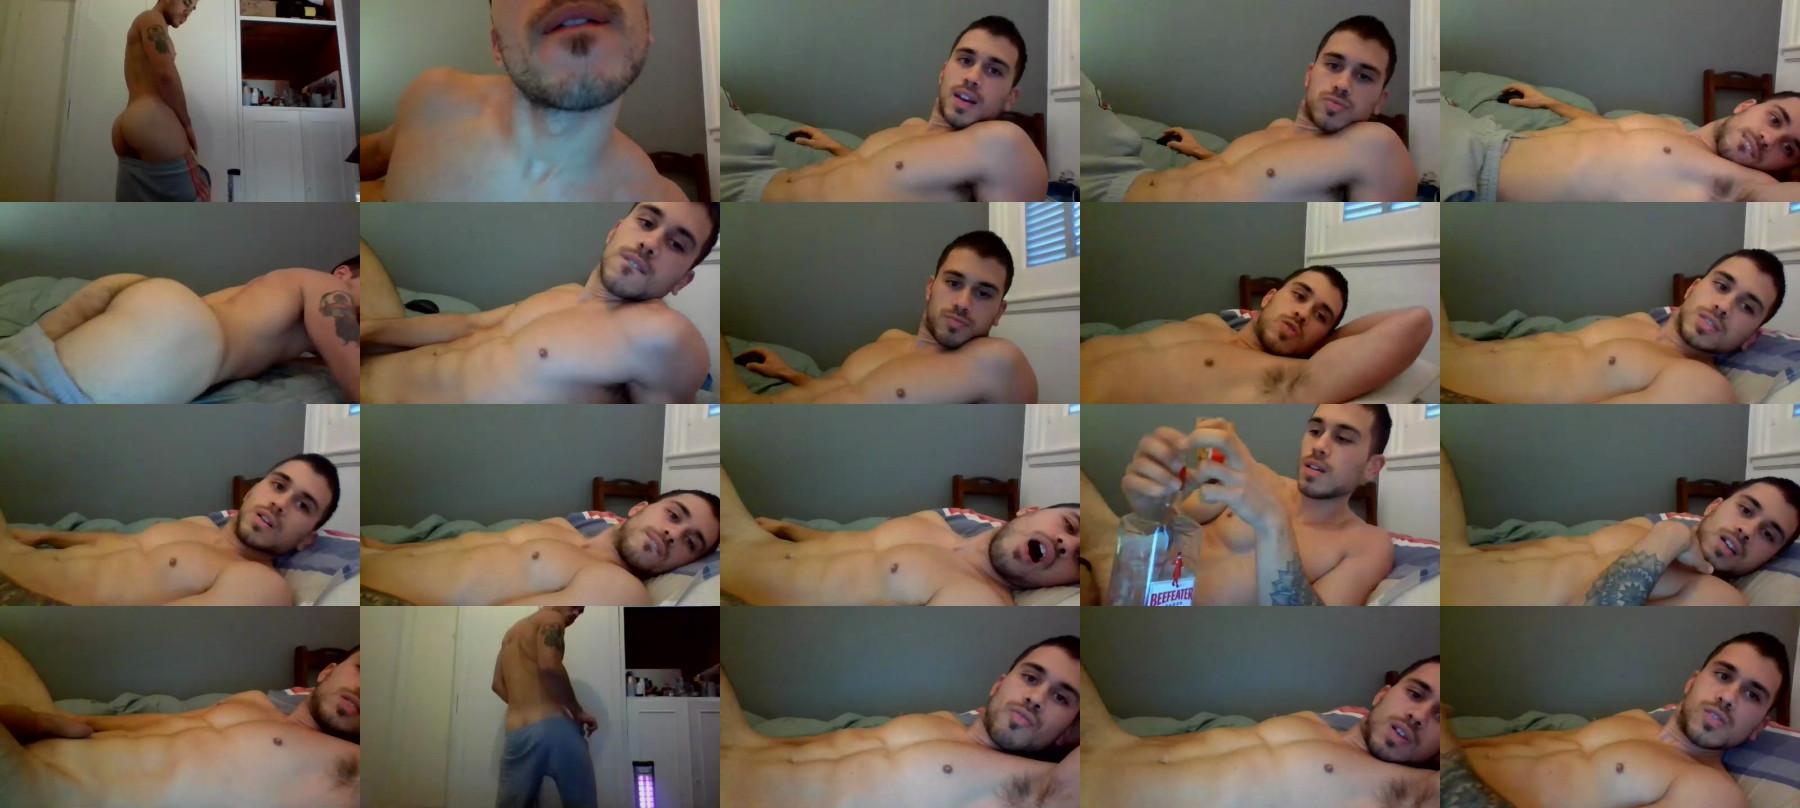 Sexxboy_Bb Chaturbate 23-06-2021 Male Cam